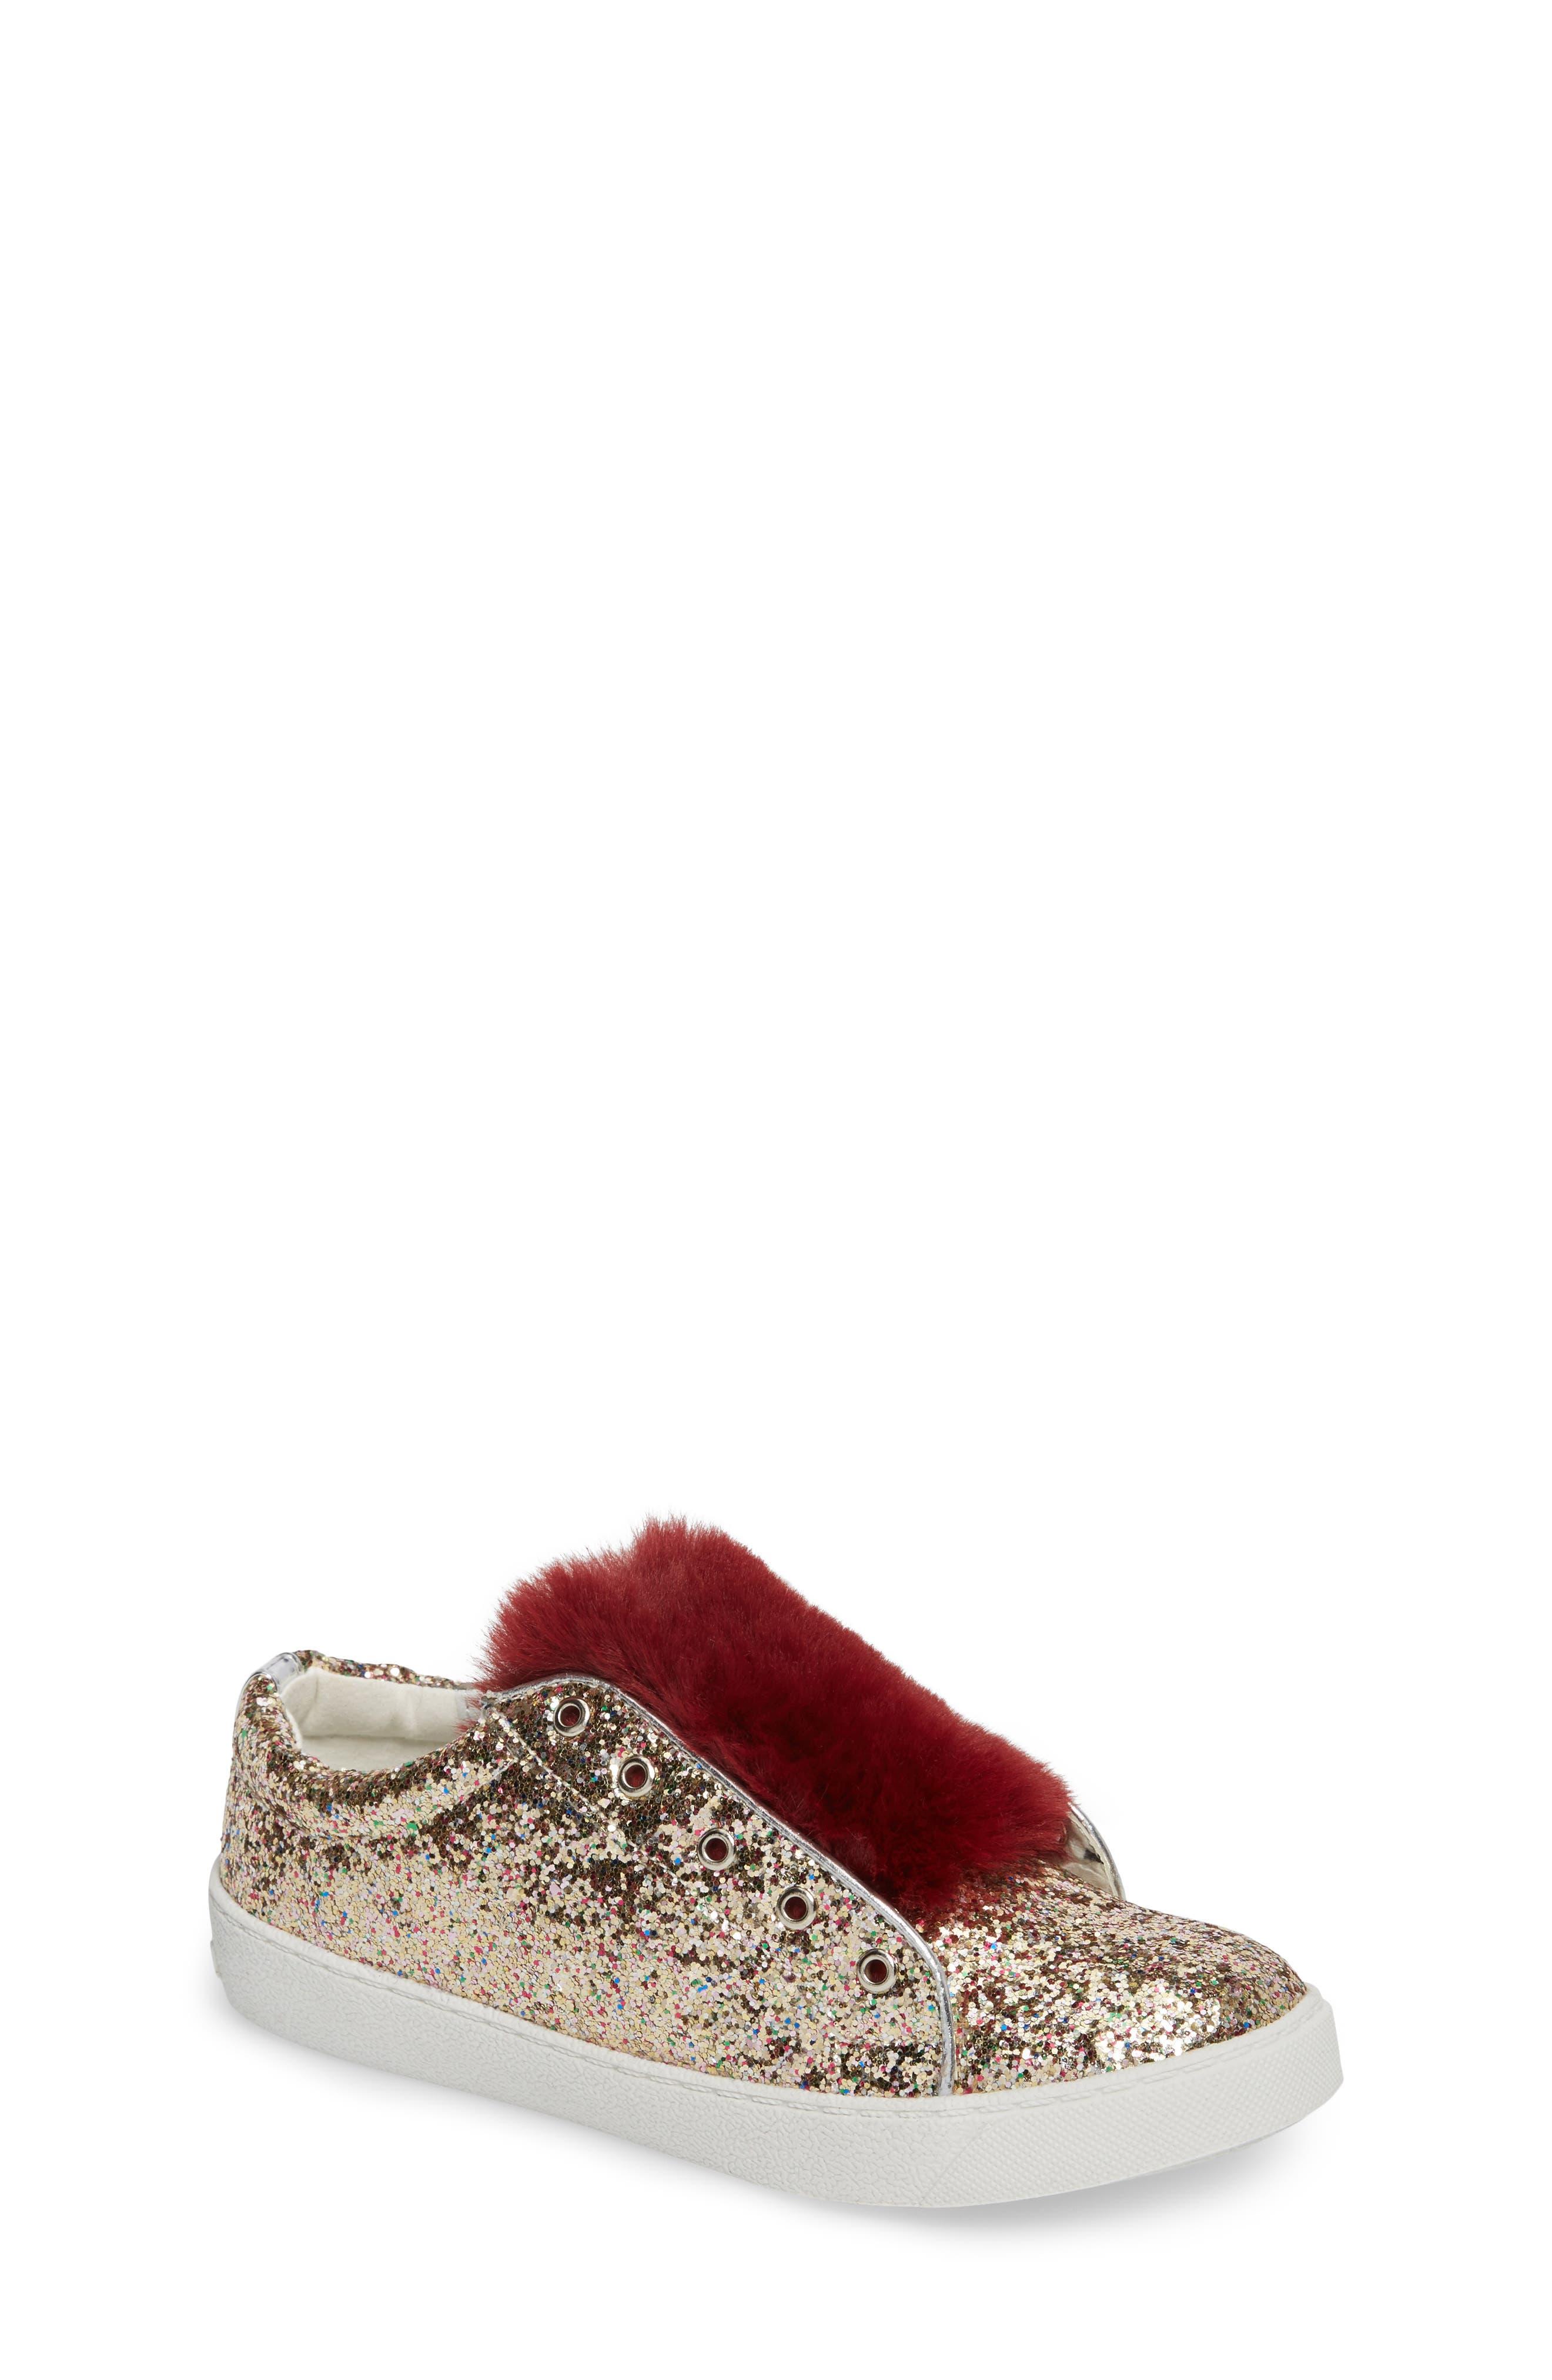 Alternate Image 1 Selected - Sam Edelman Britt Rita Faux Fur Glitter Sneaker (Toddler, Little Kid & Big Kid)